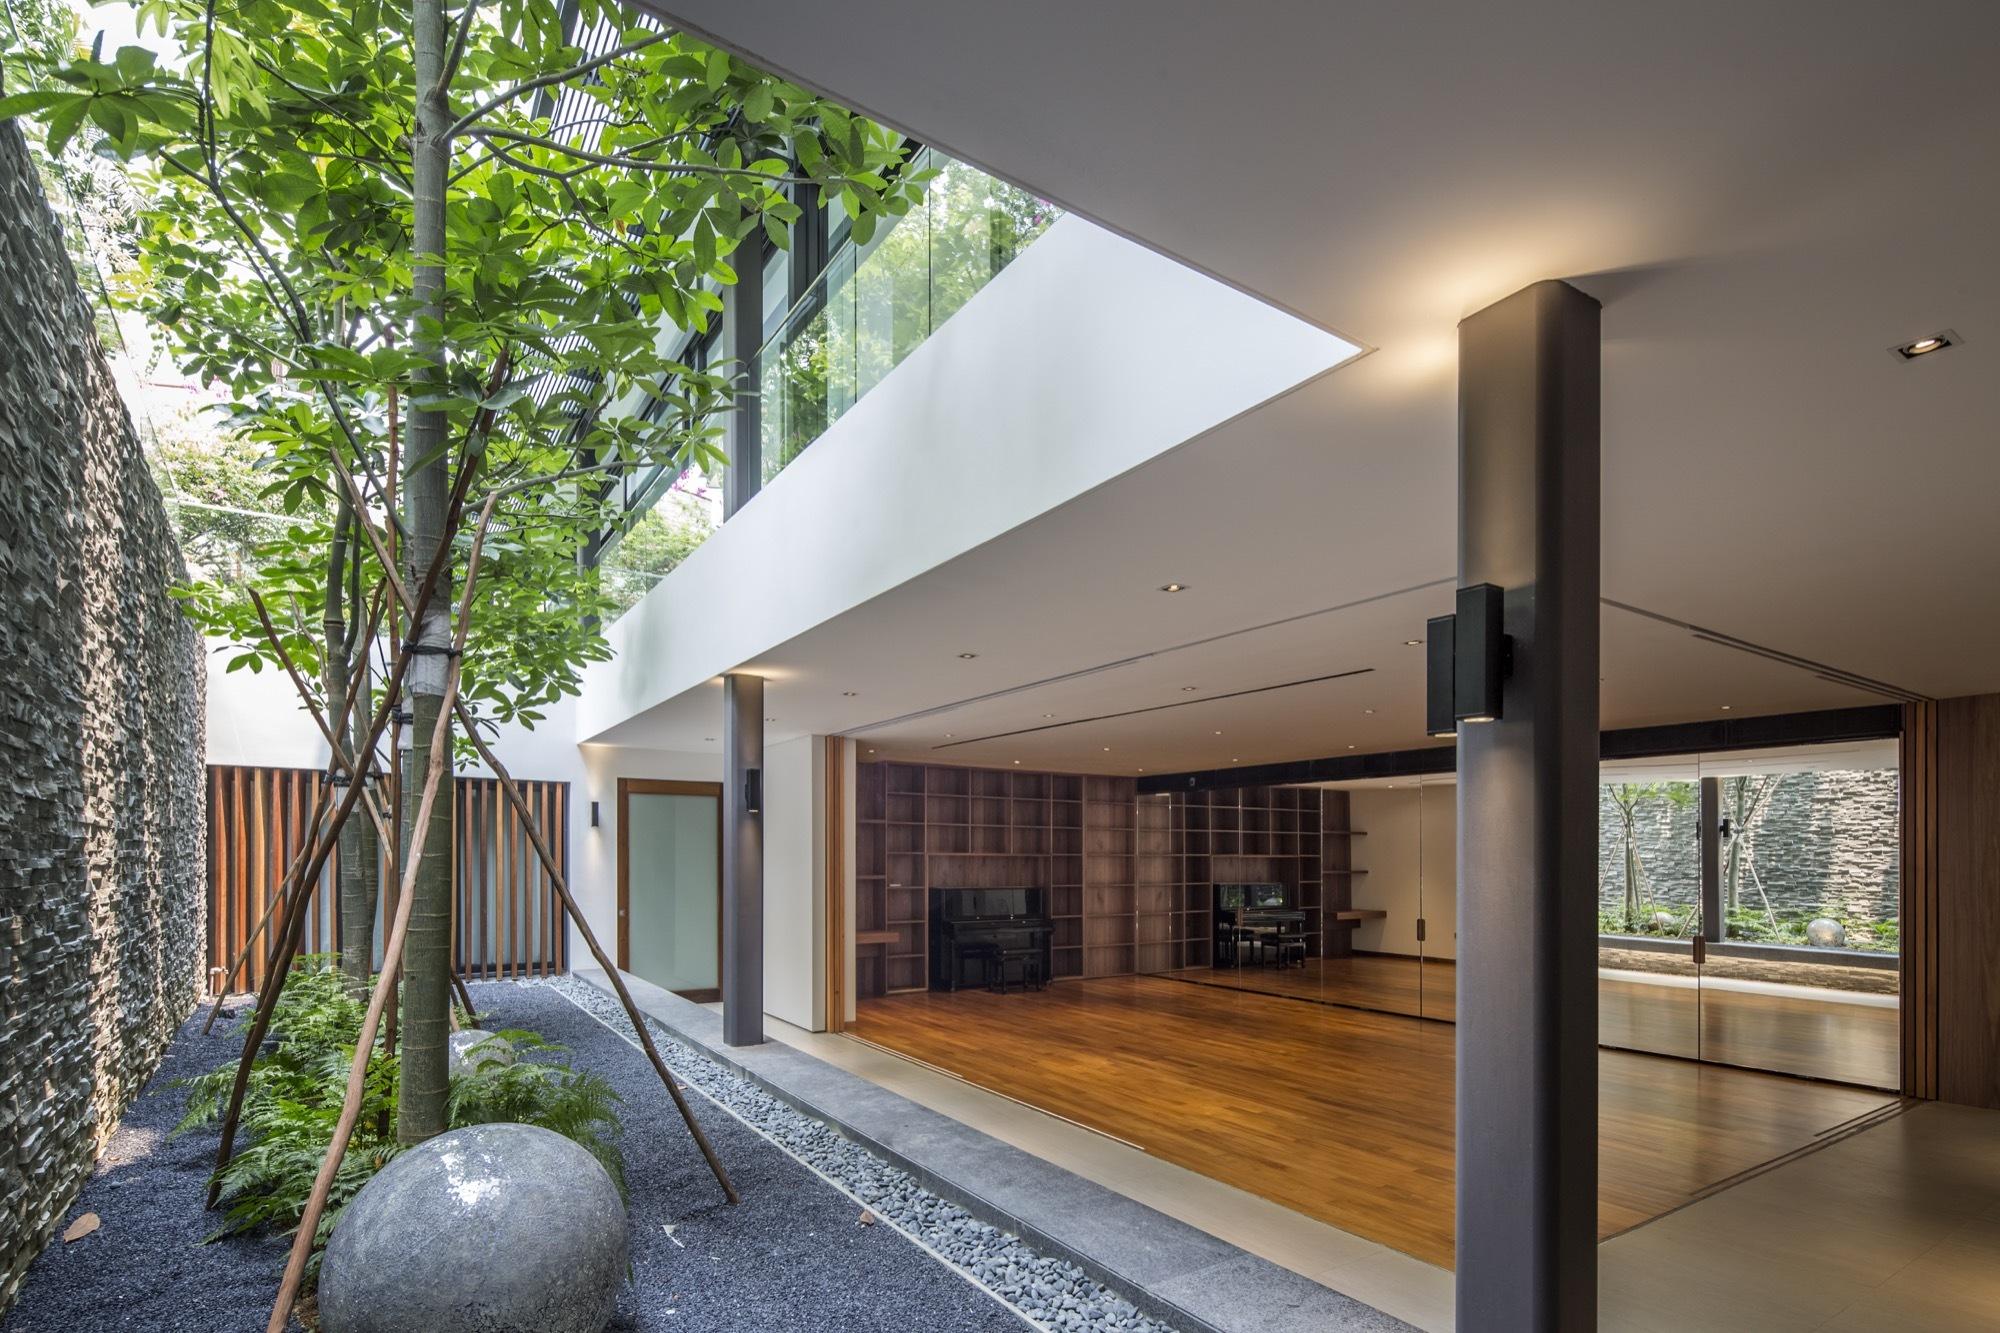 galeria de casa do jardim secreto wallflower